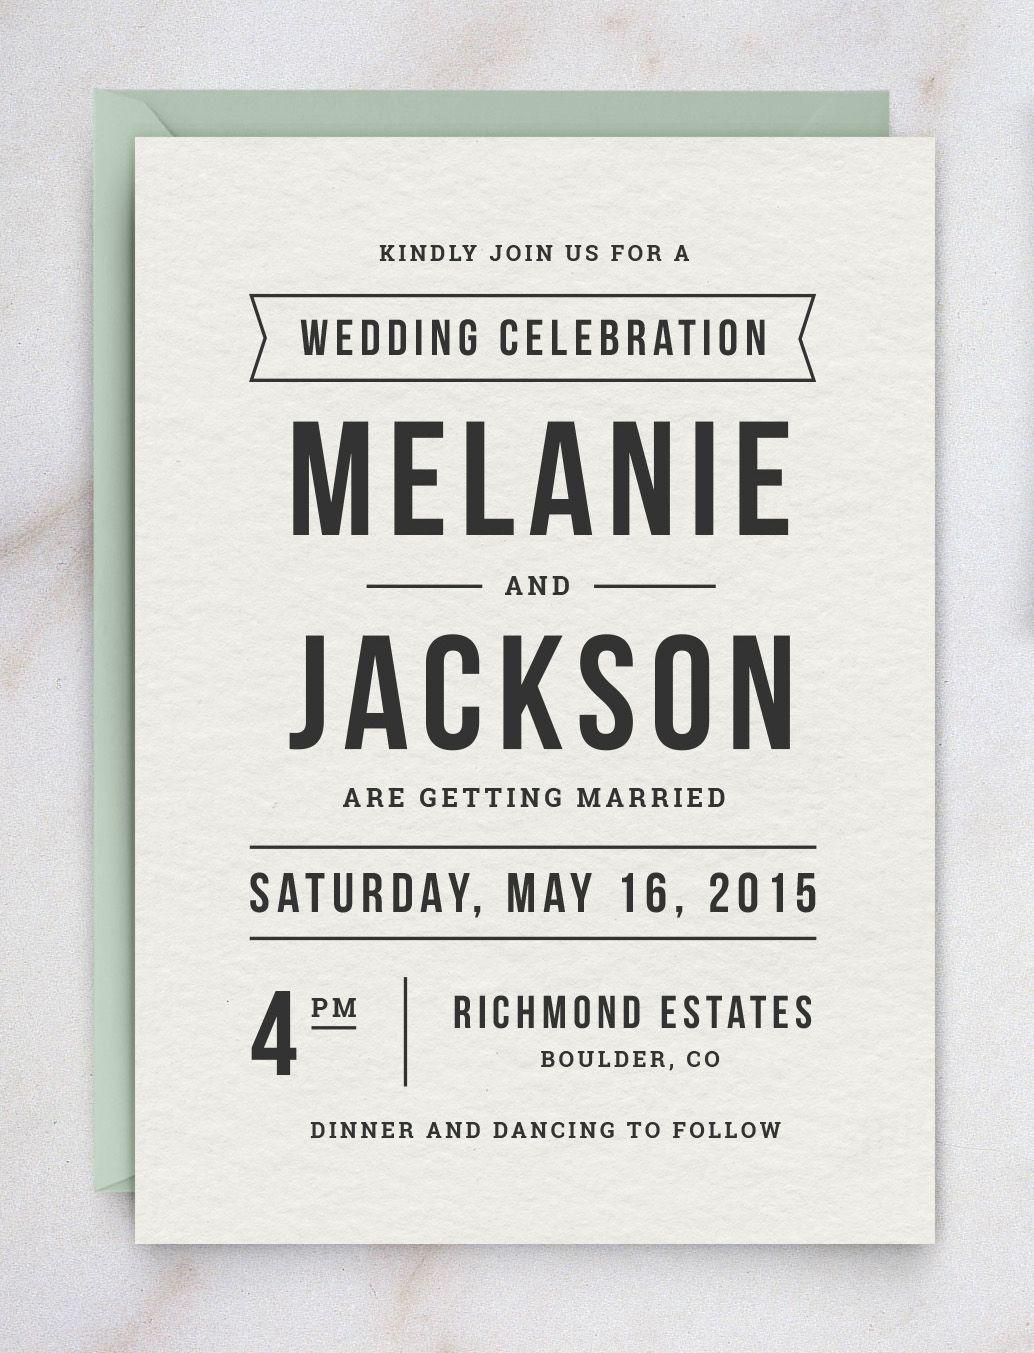 Diy wedding invitations get this elegant invitation template with